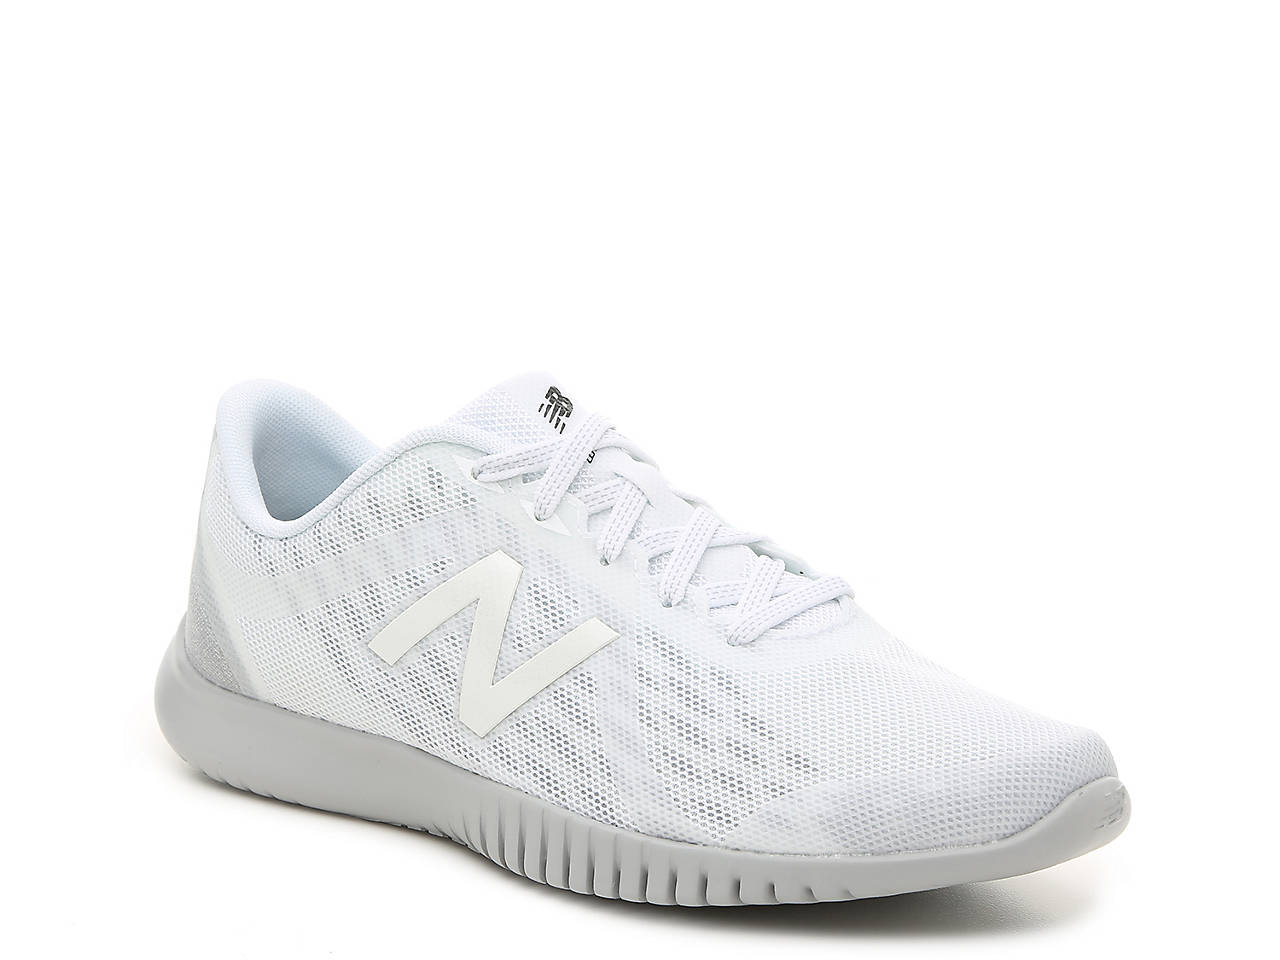 2caab79480806 New Balance 66 Training Shoe - Women's Women's Shoes | DSW